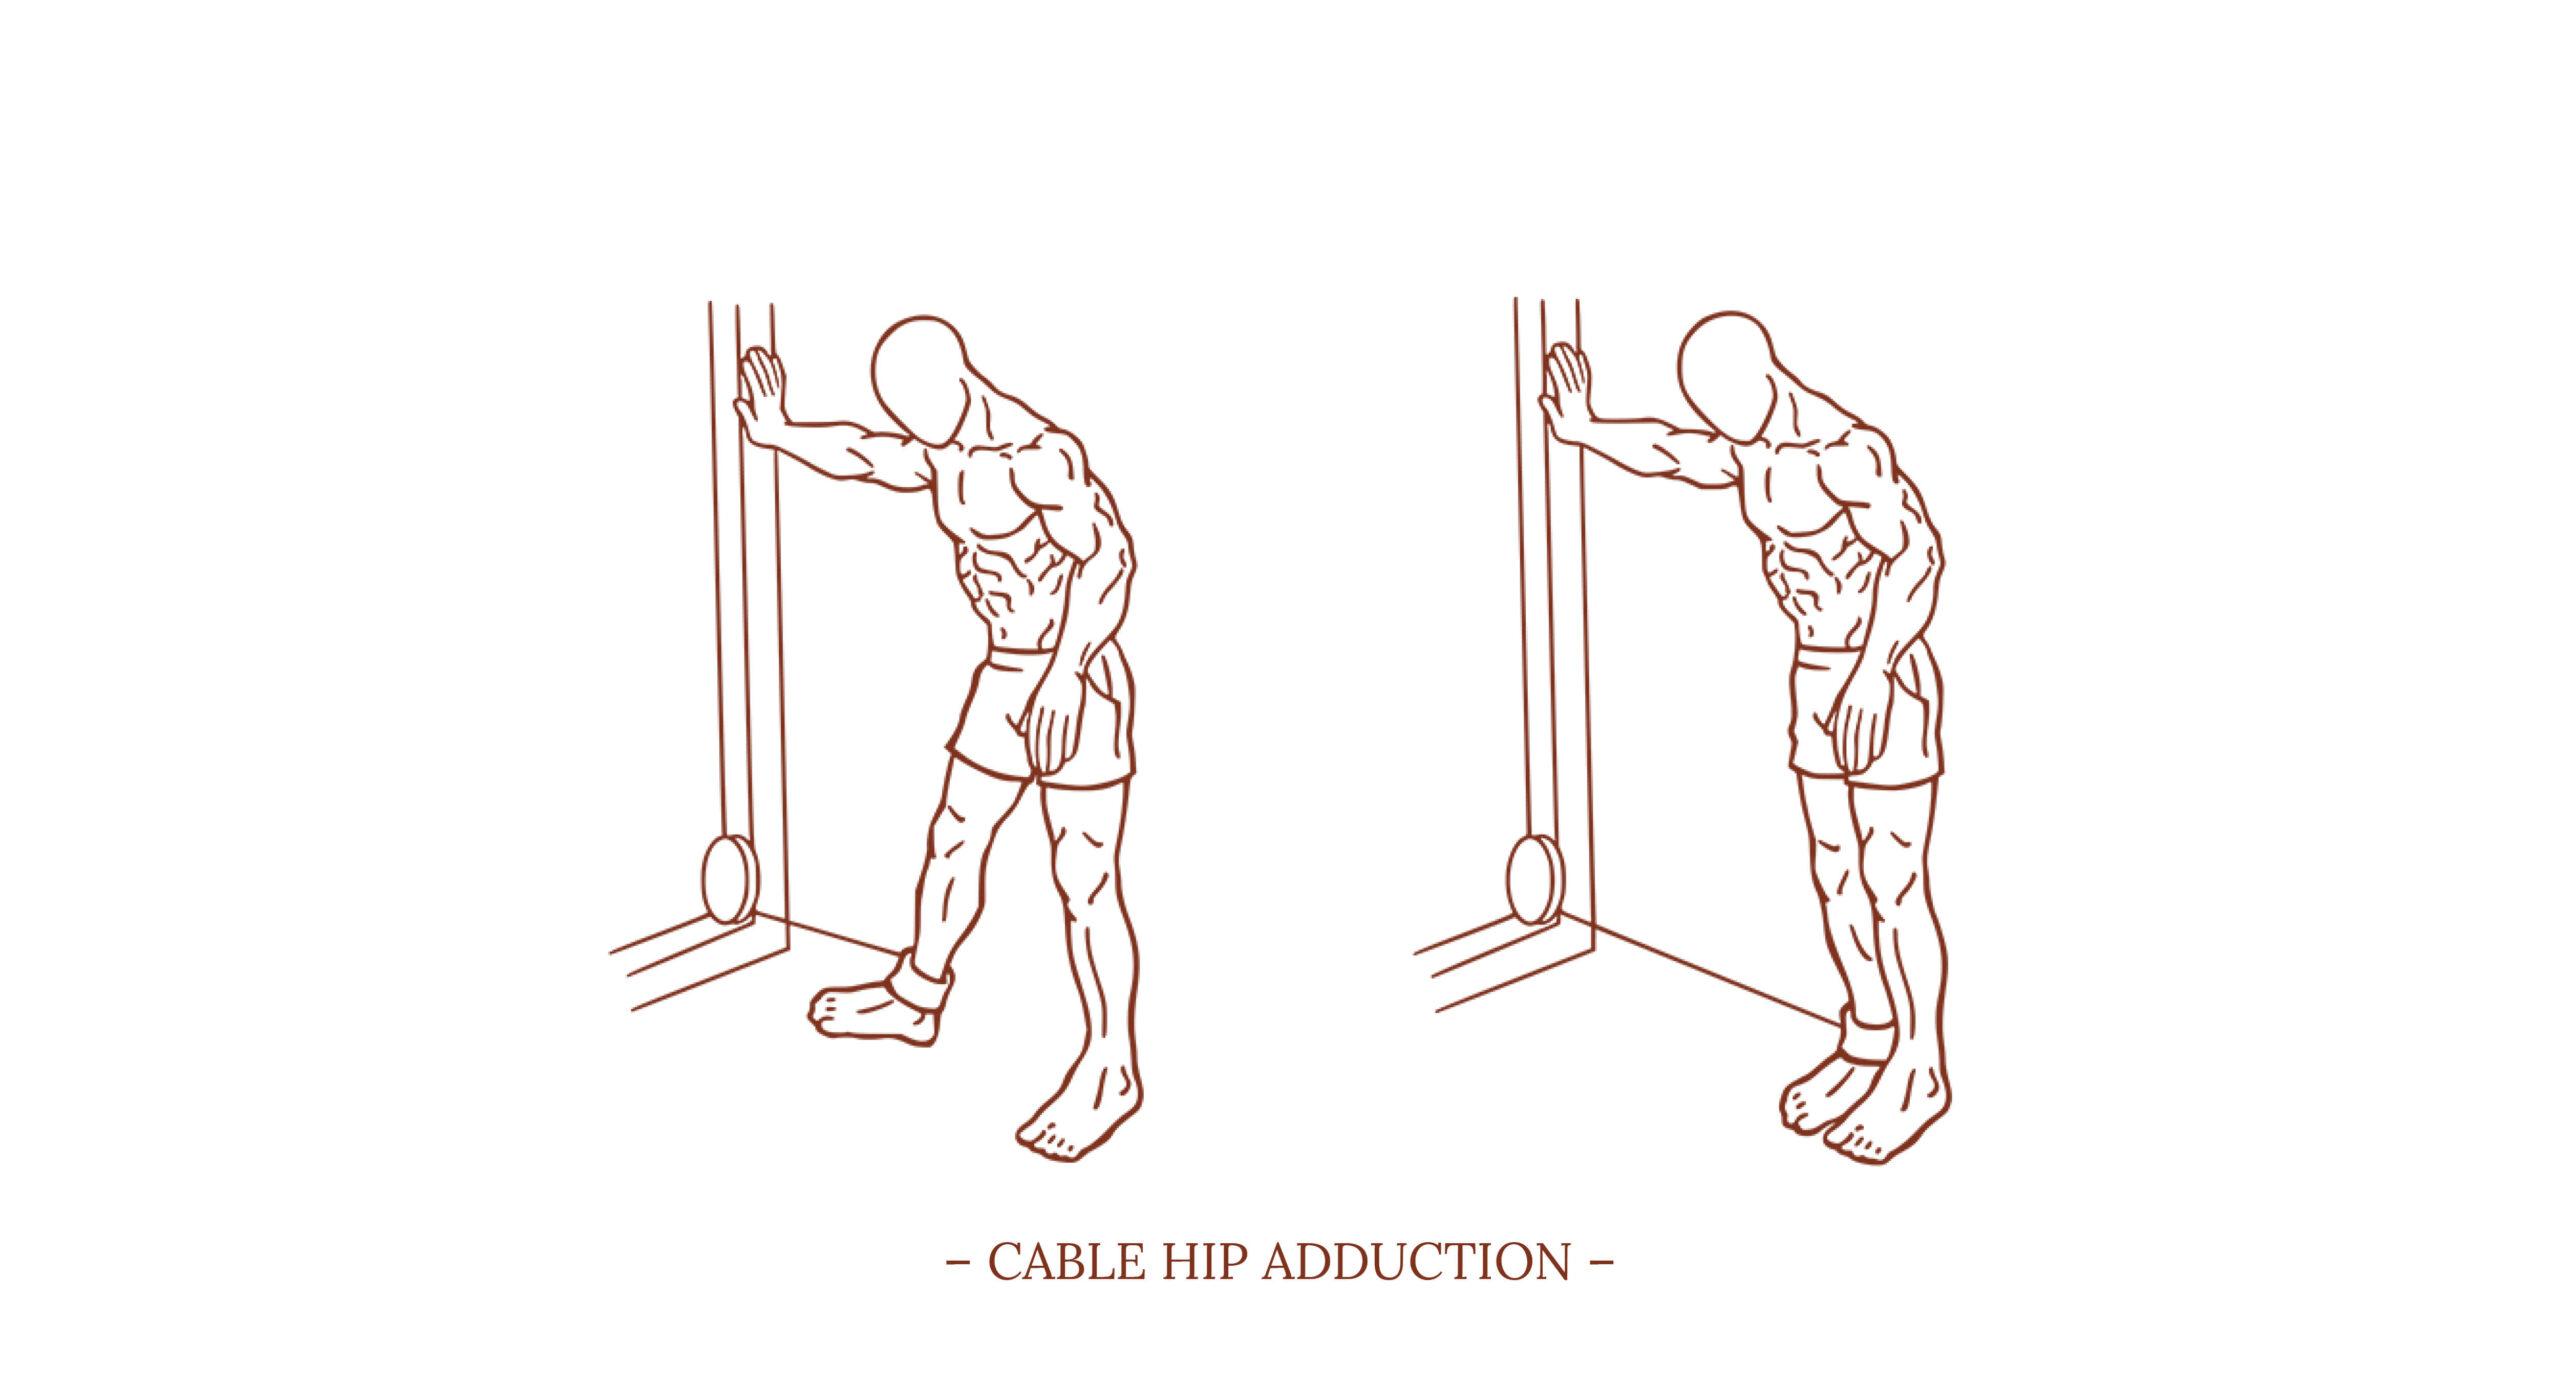 Cable Hip Adduction Illustration